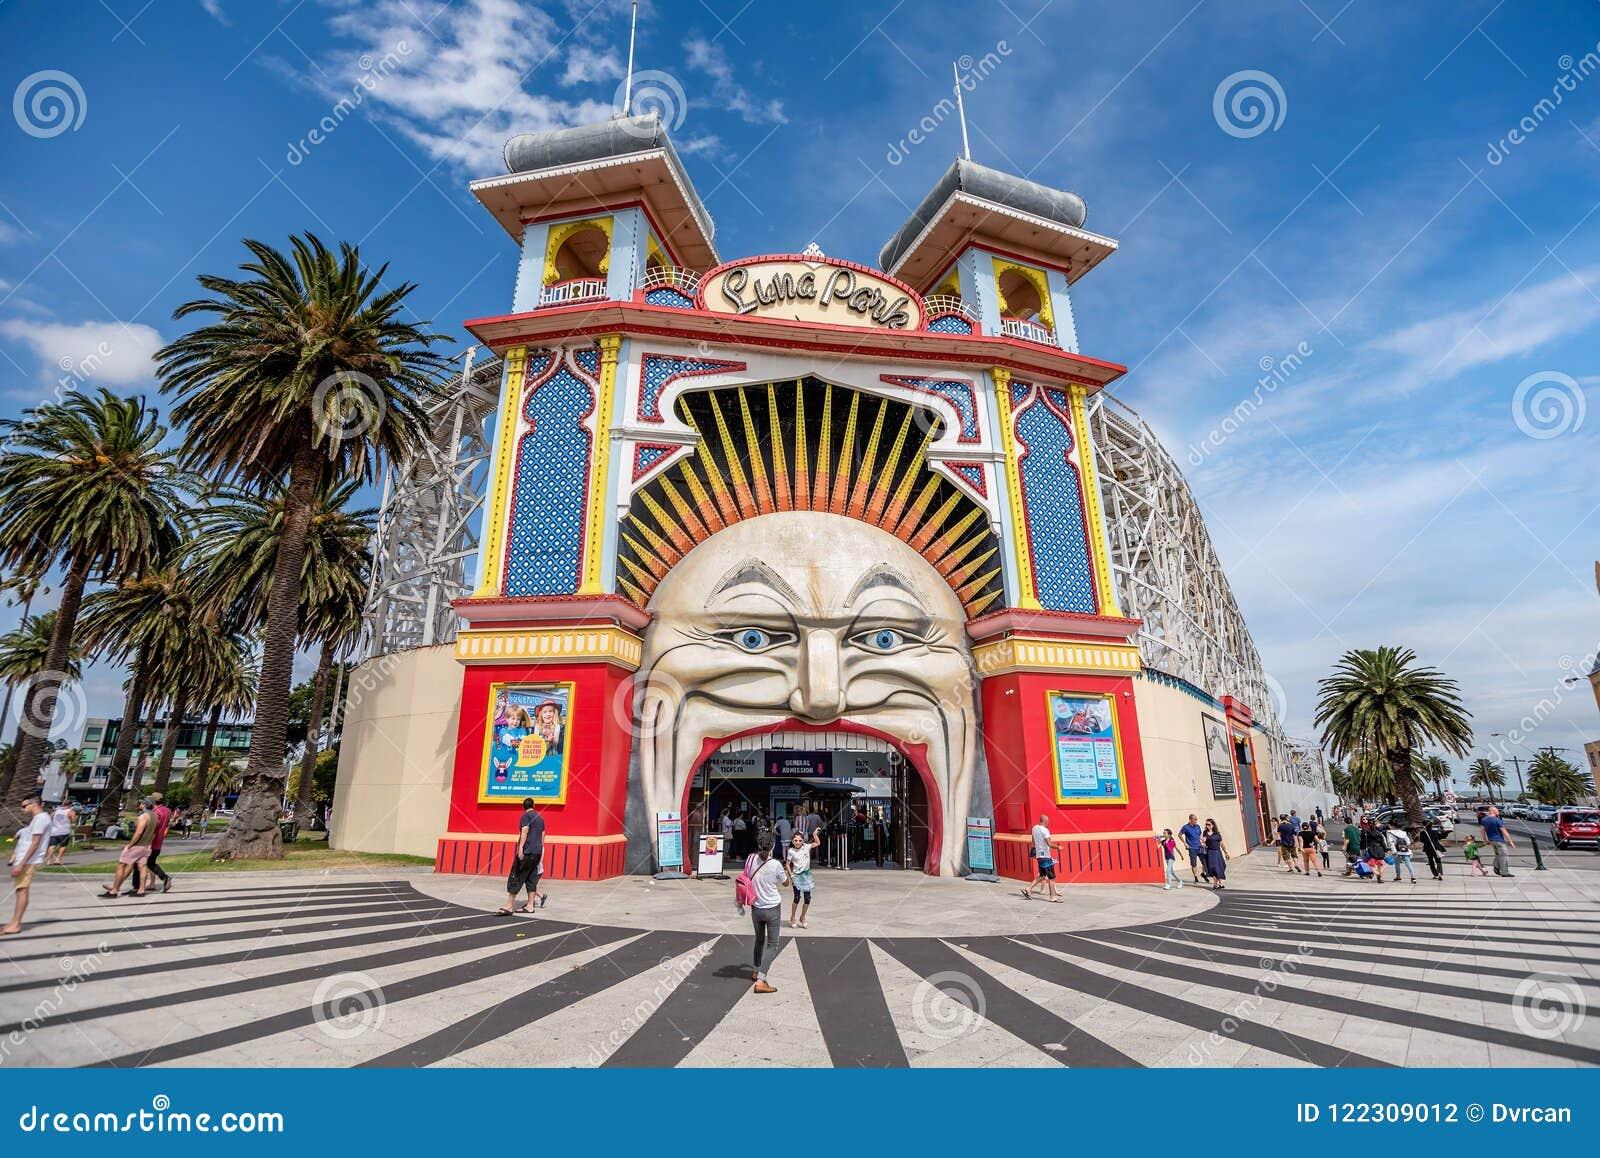 Parque do amuzement de Luna Park em Melbourne, Austrália